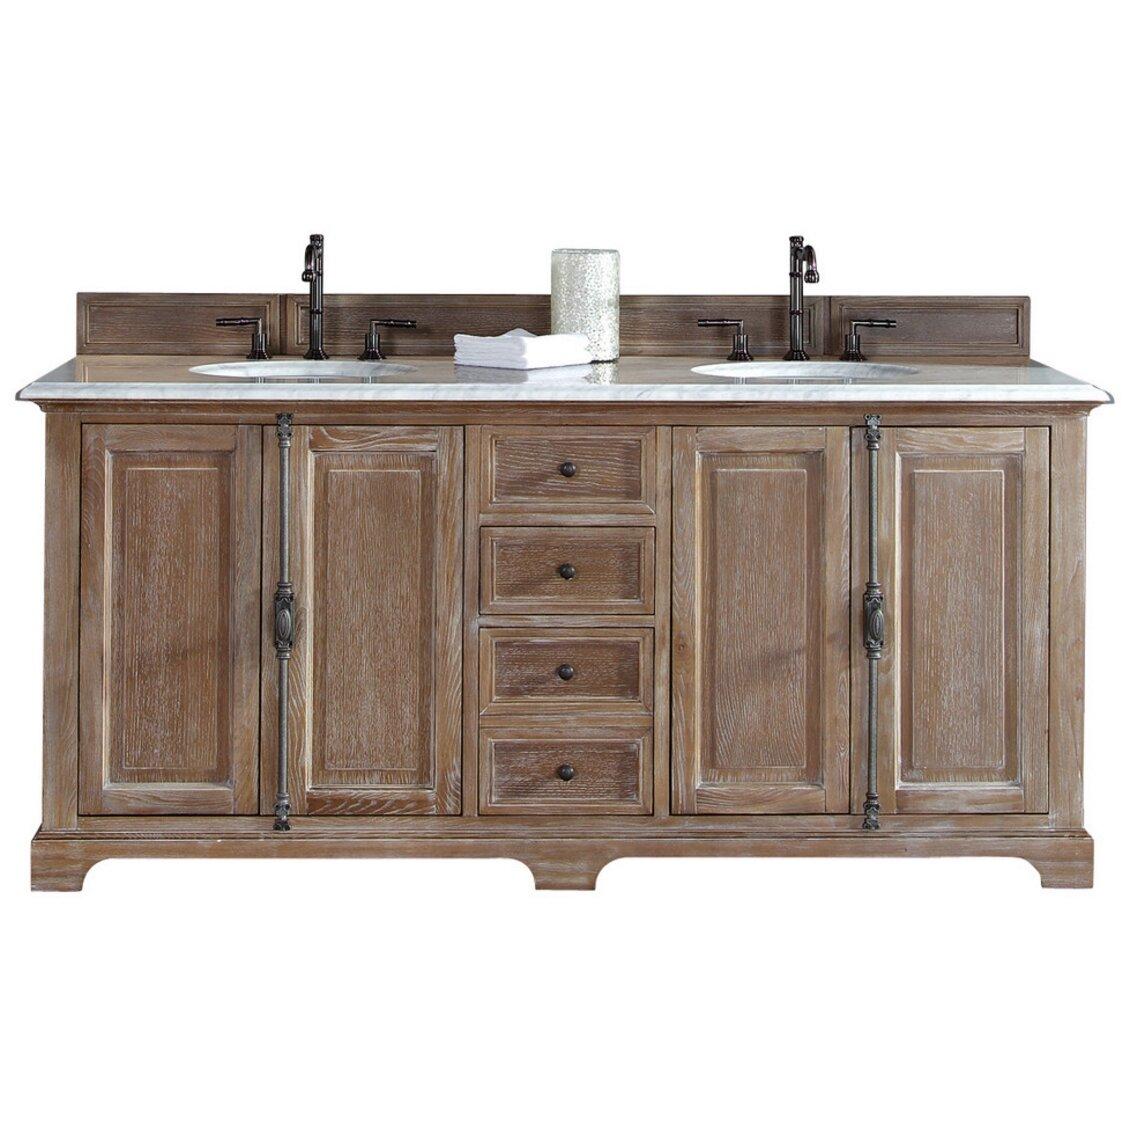 Driftwood Bathroom Vanity James Martin Furniture Providence 72 Double Driftwood Bathroom